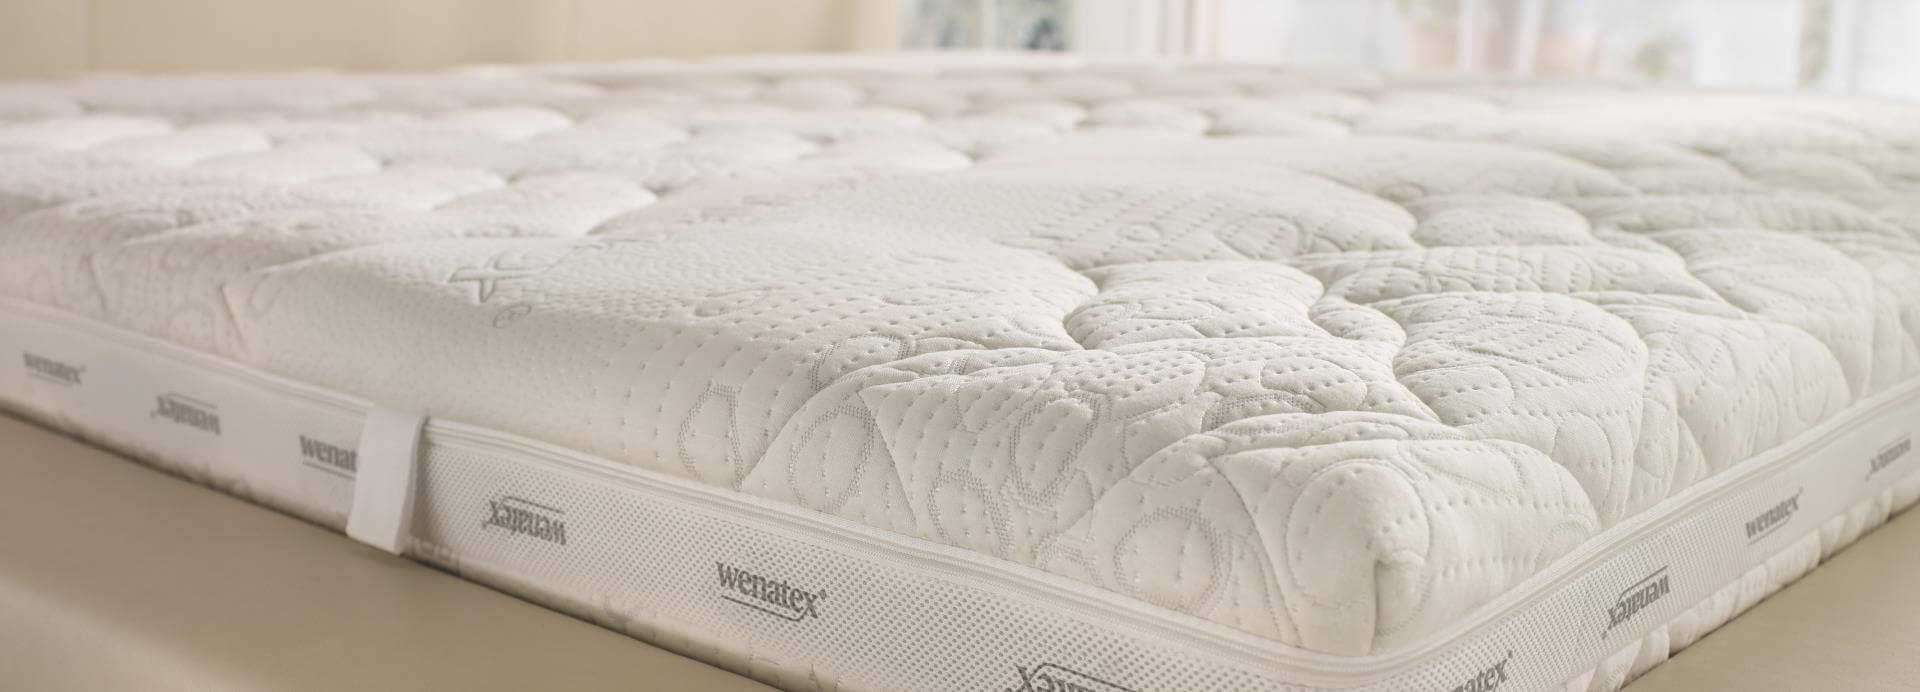 wenaCel® sensitive mattress | Mattress sizes – standard and custom